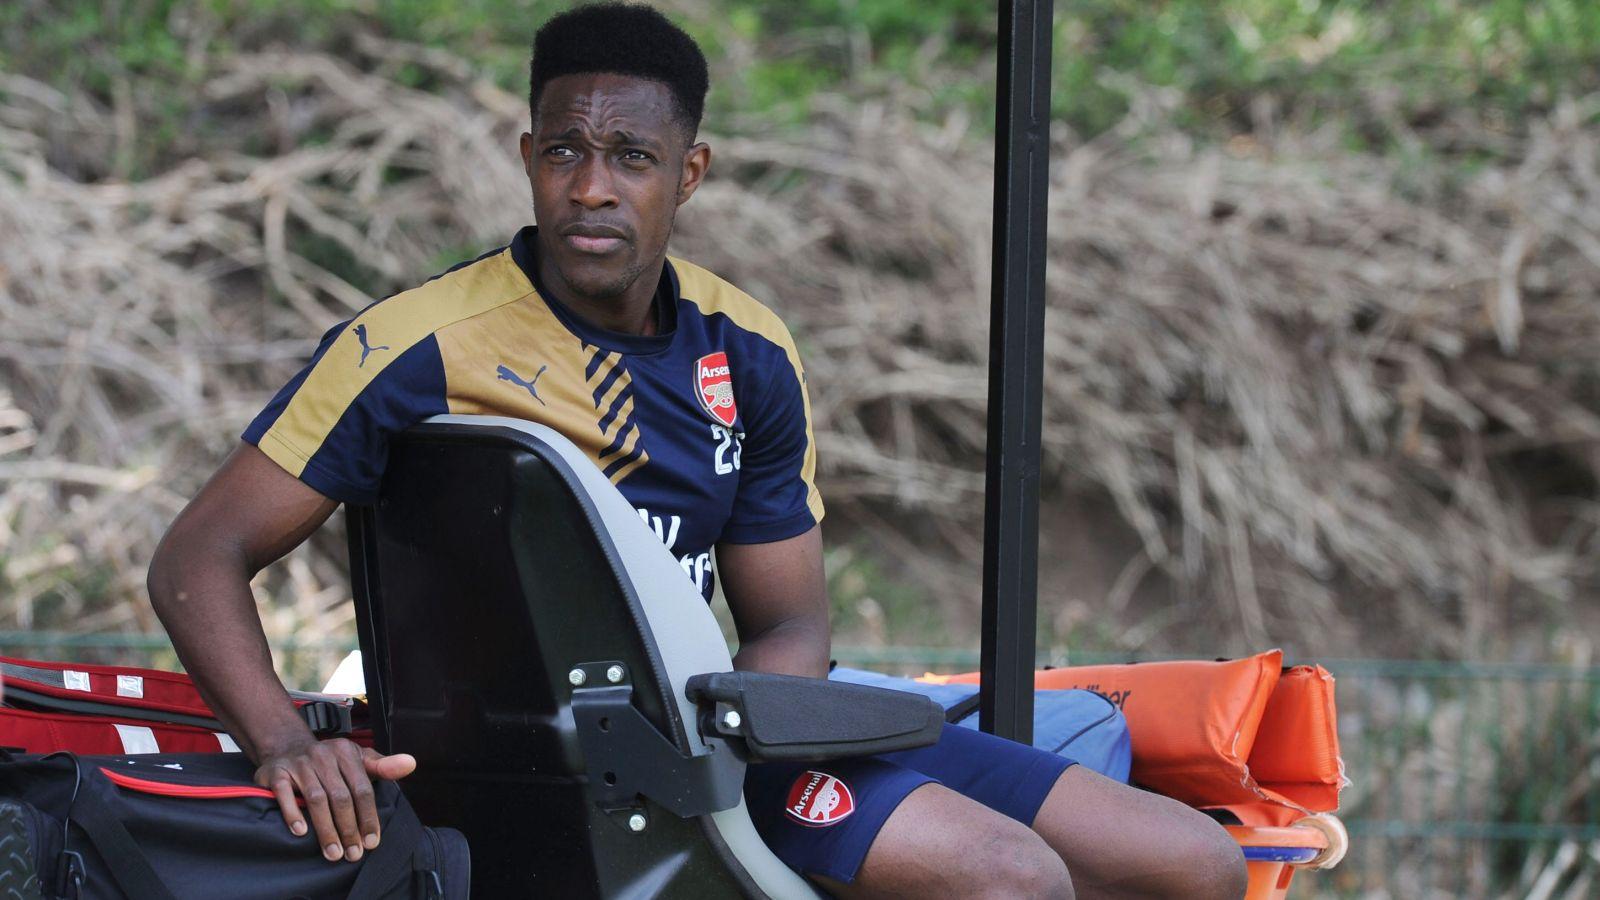 Arsenal star Welbeck undergoes surgery, set to miss nine months